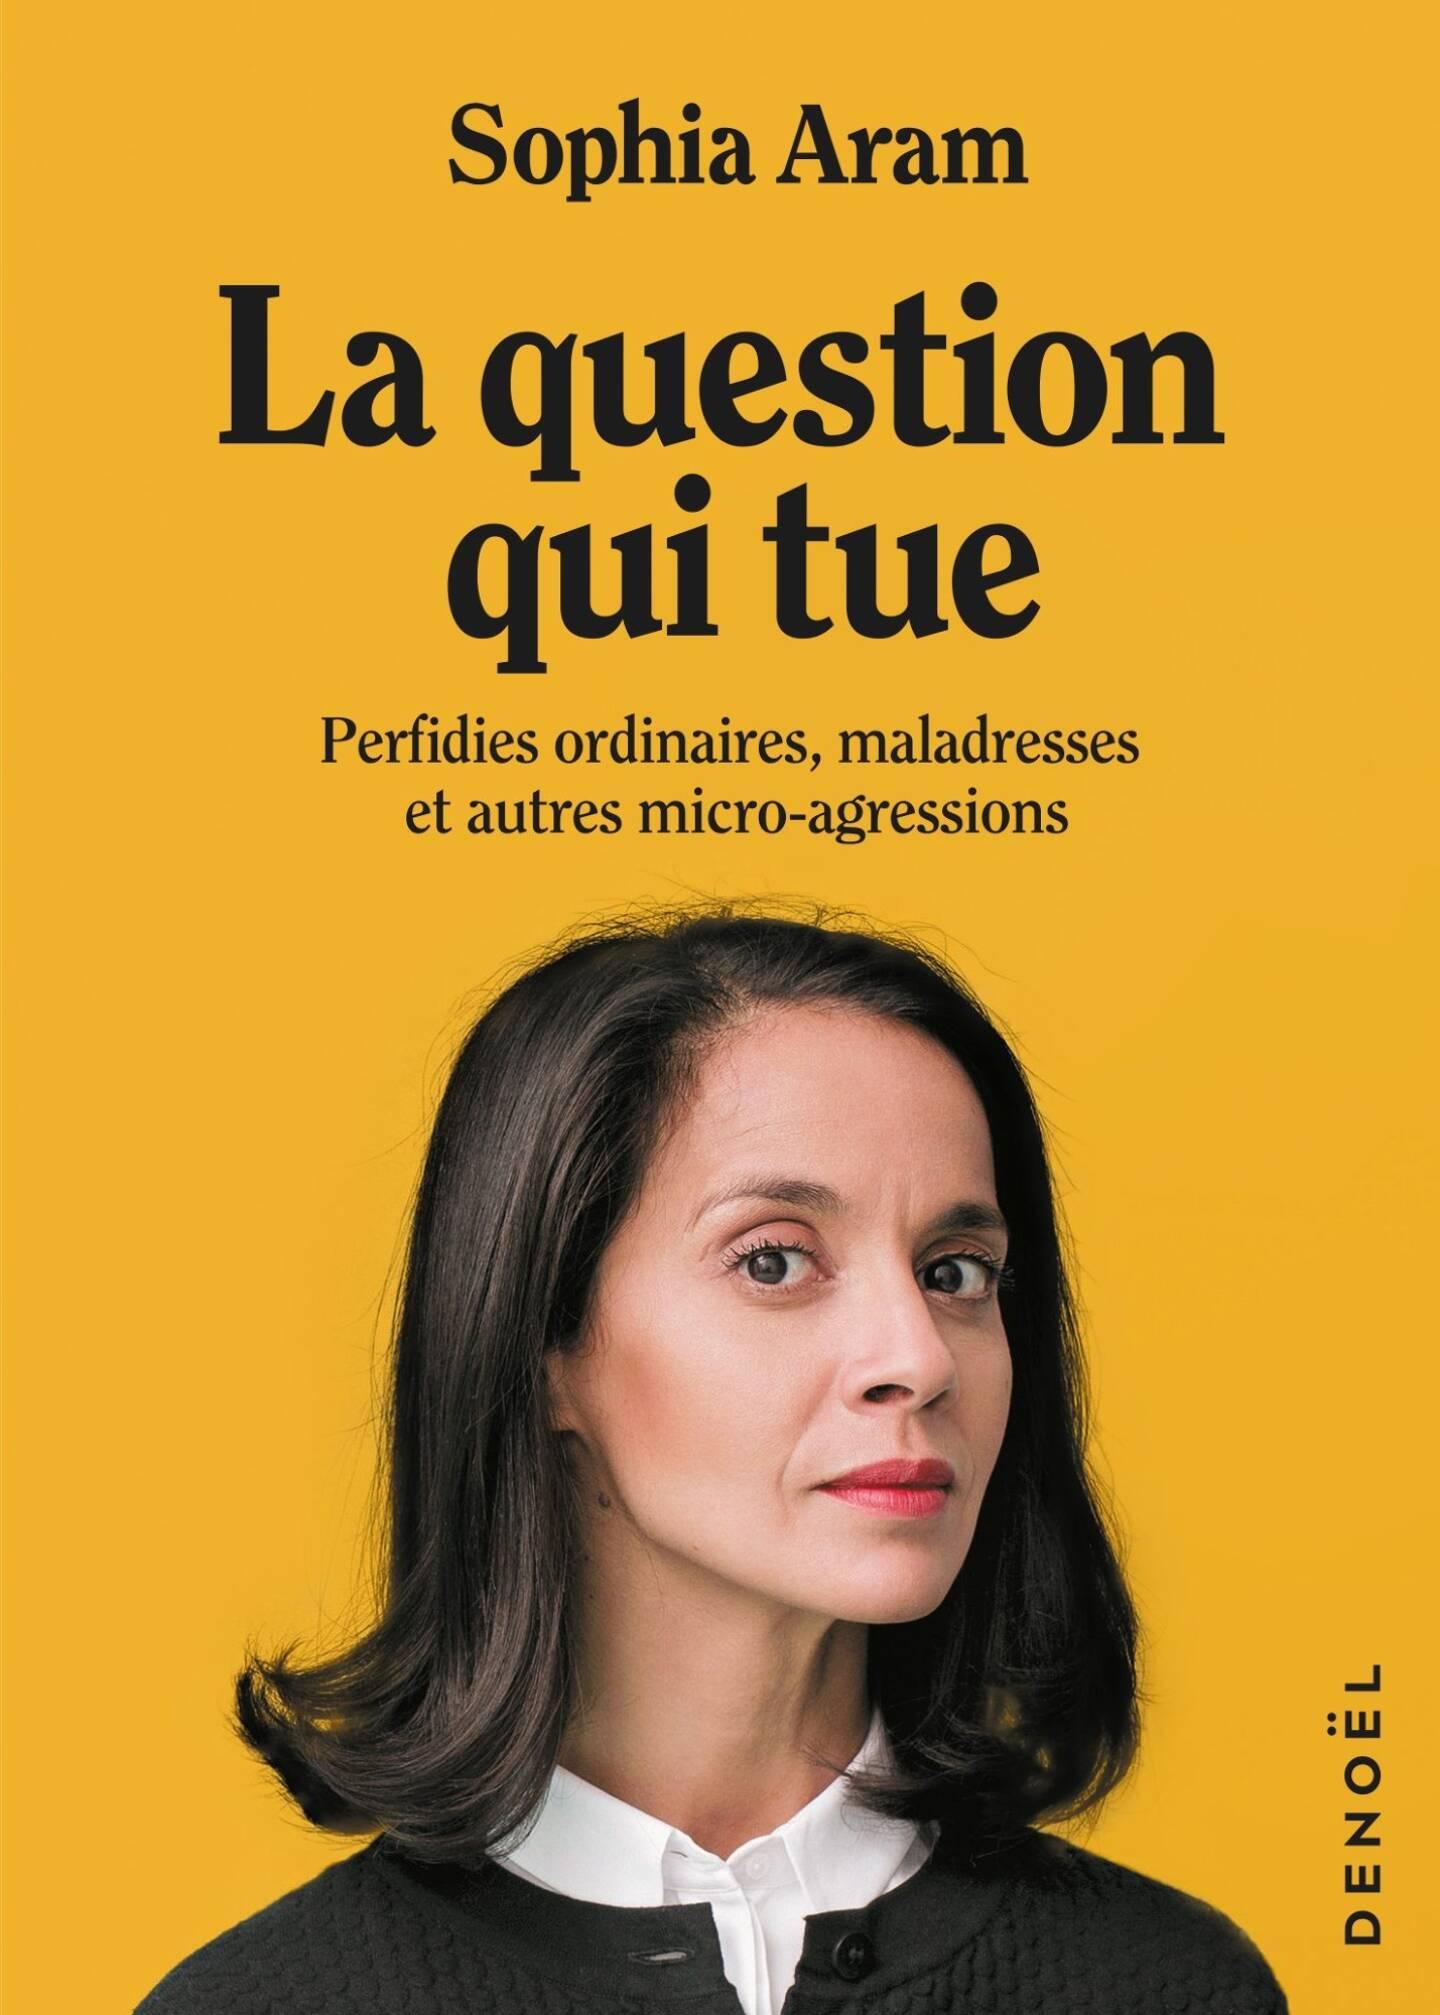 """La question qui tue"" de Sophia Aram. Editions Denoël. 128 pages. 12 euros."